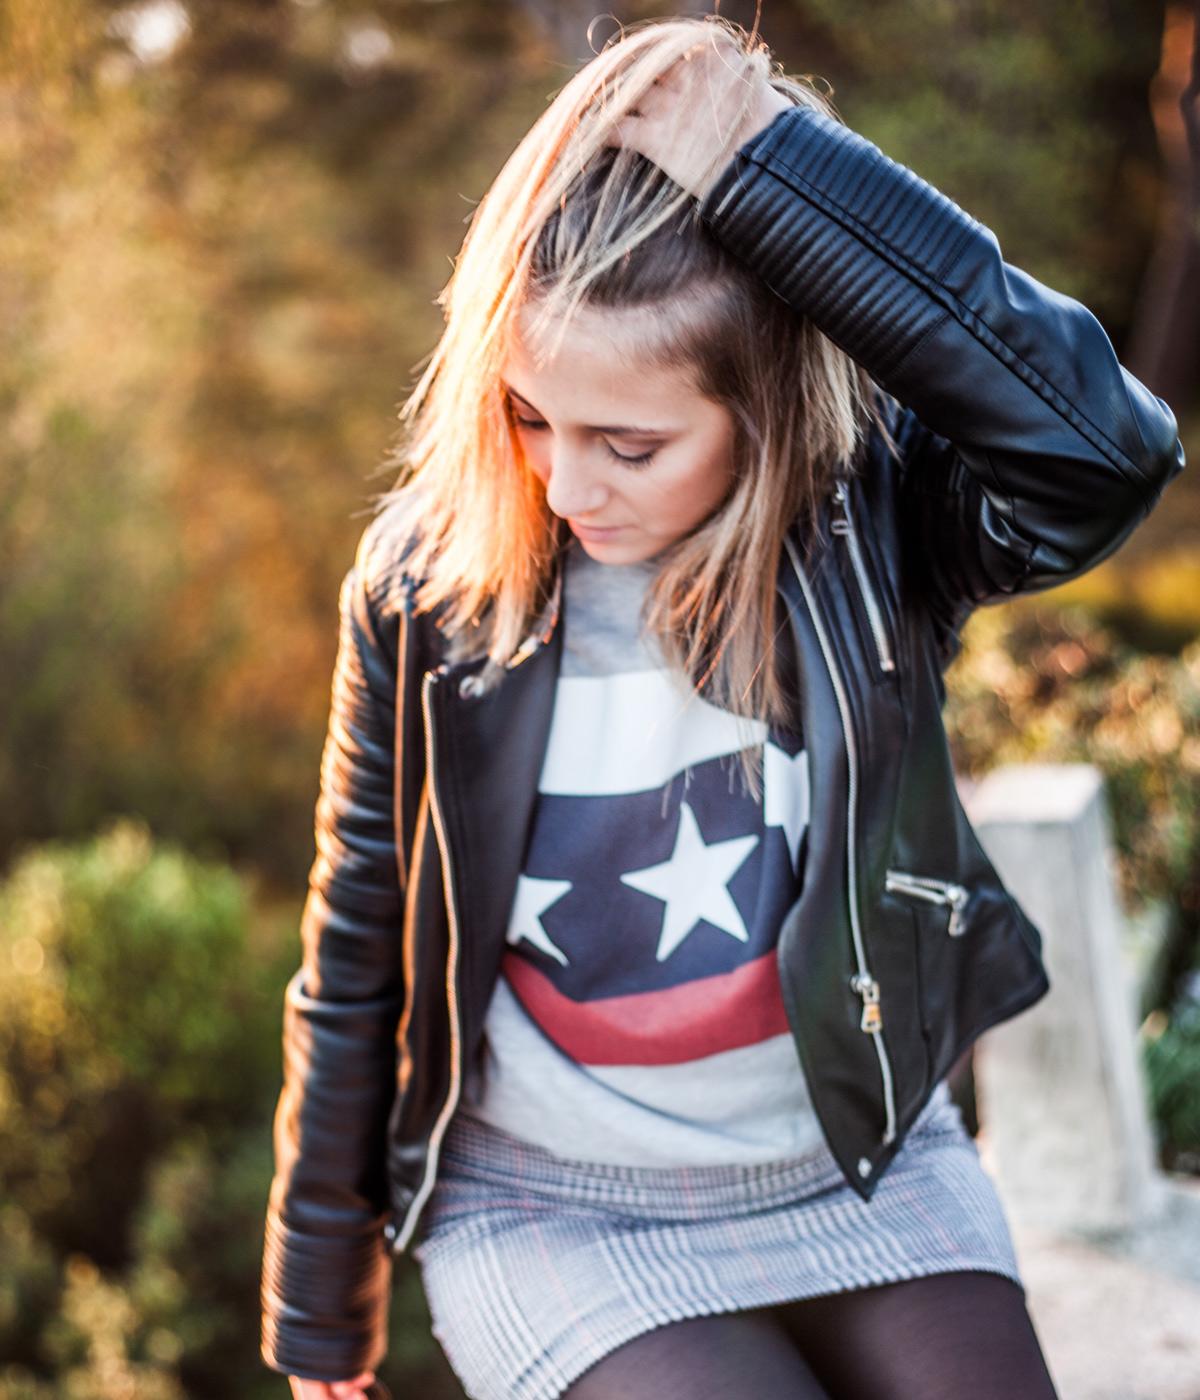 vanessa-sweater-pulli-rock-karorock-stiefel-3